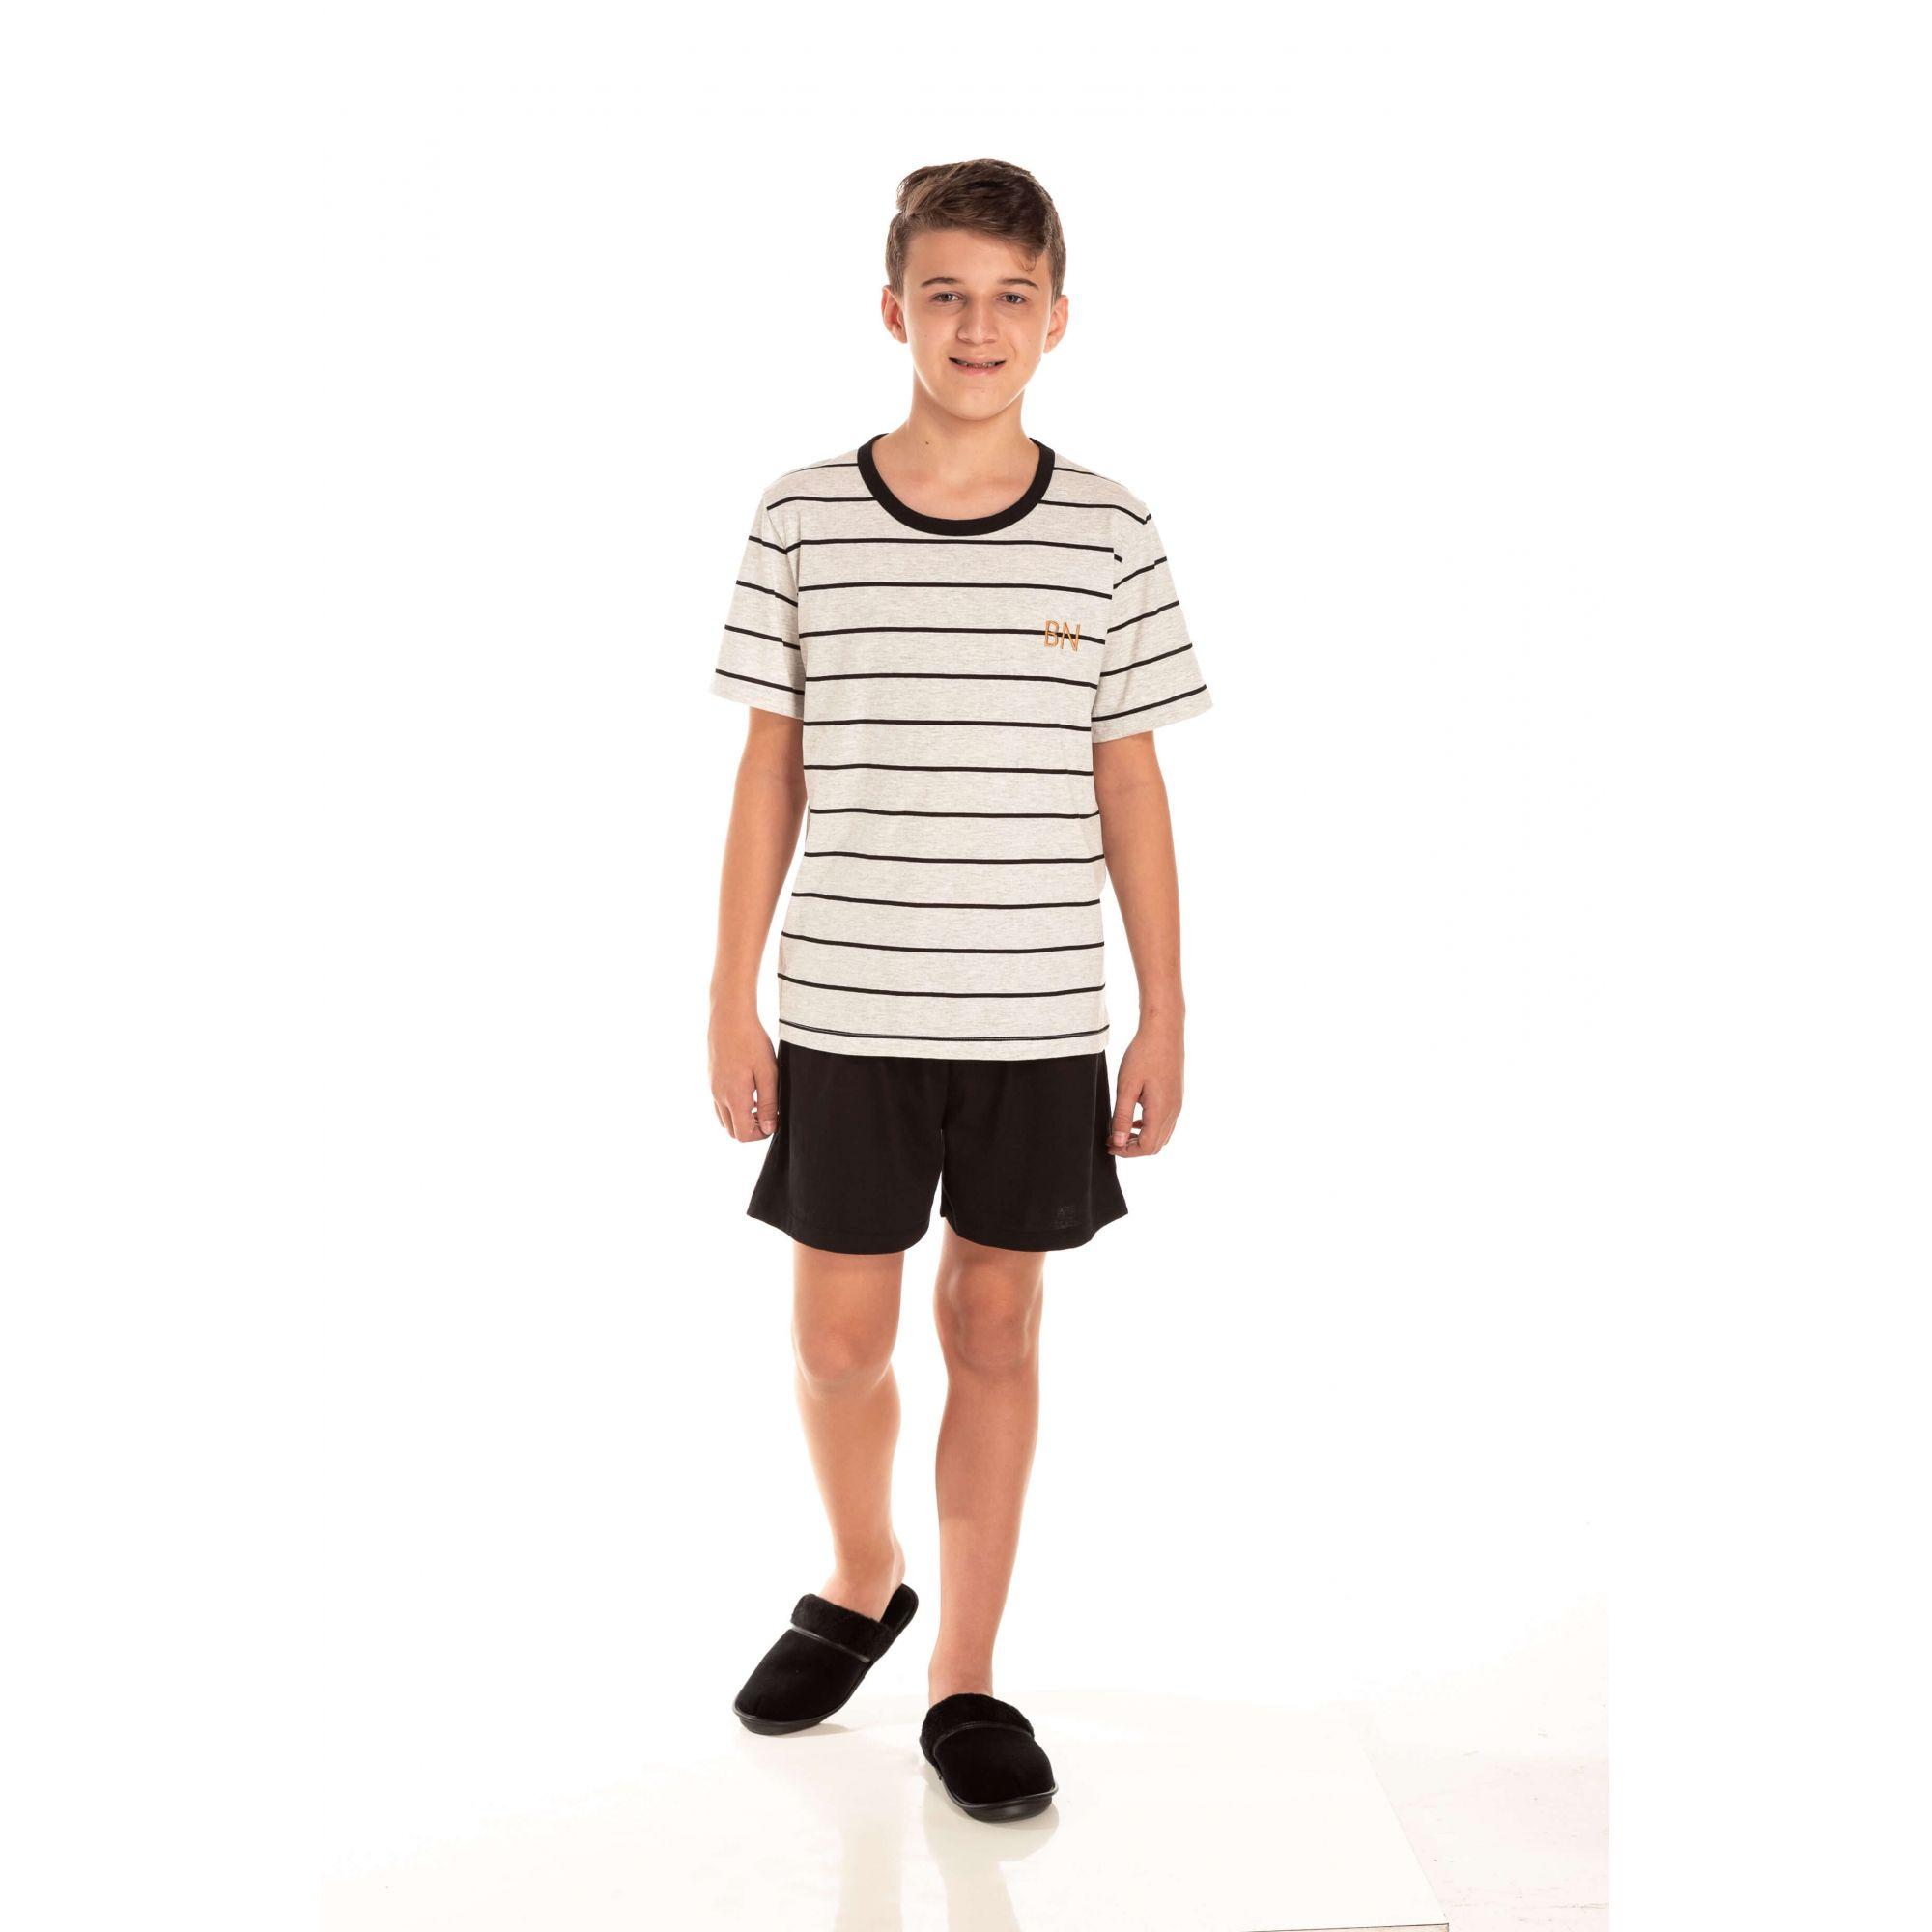 005 - Pijama Juvenil Masculino Listrado - Pérola